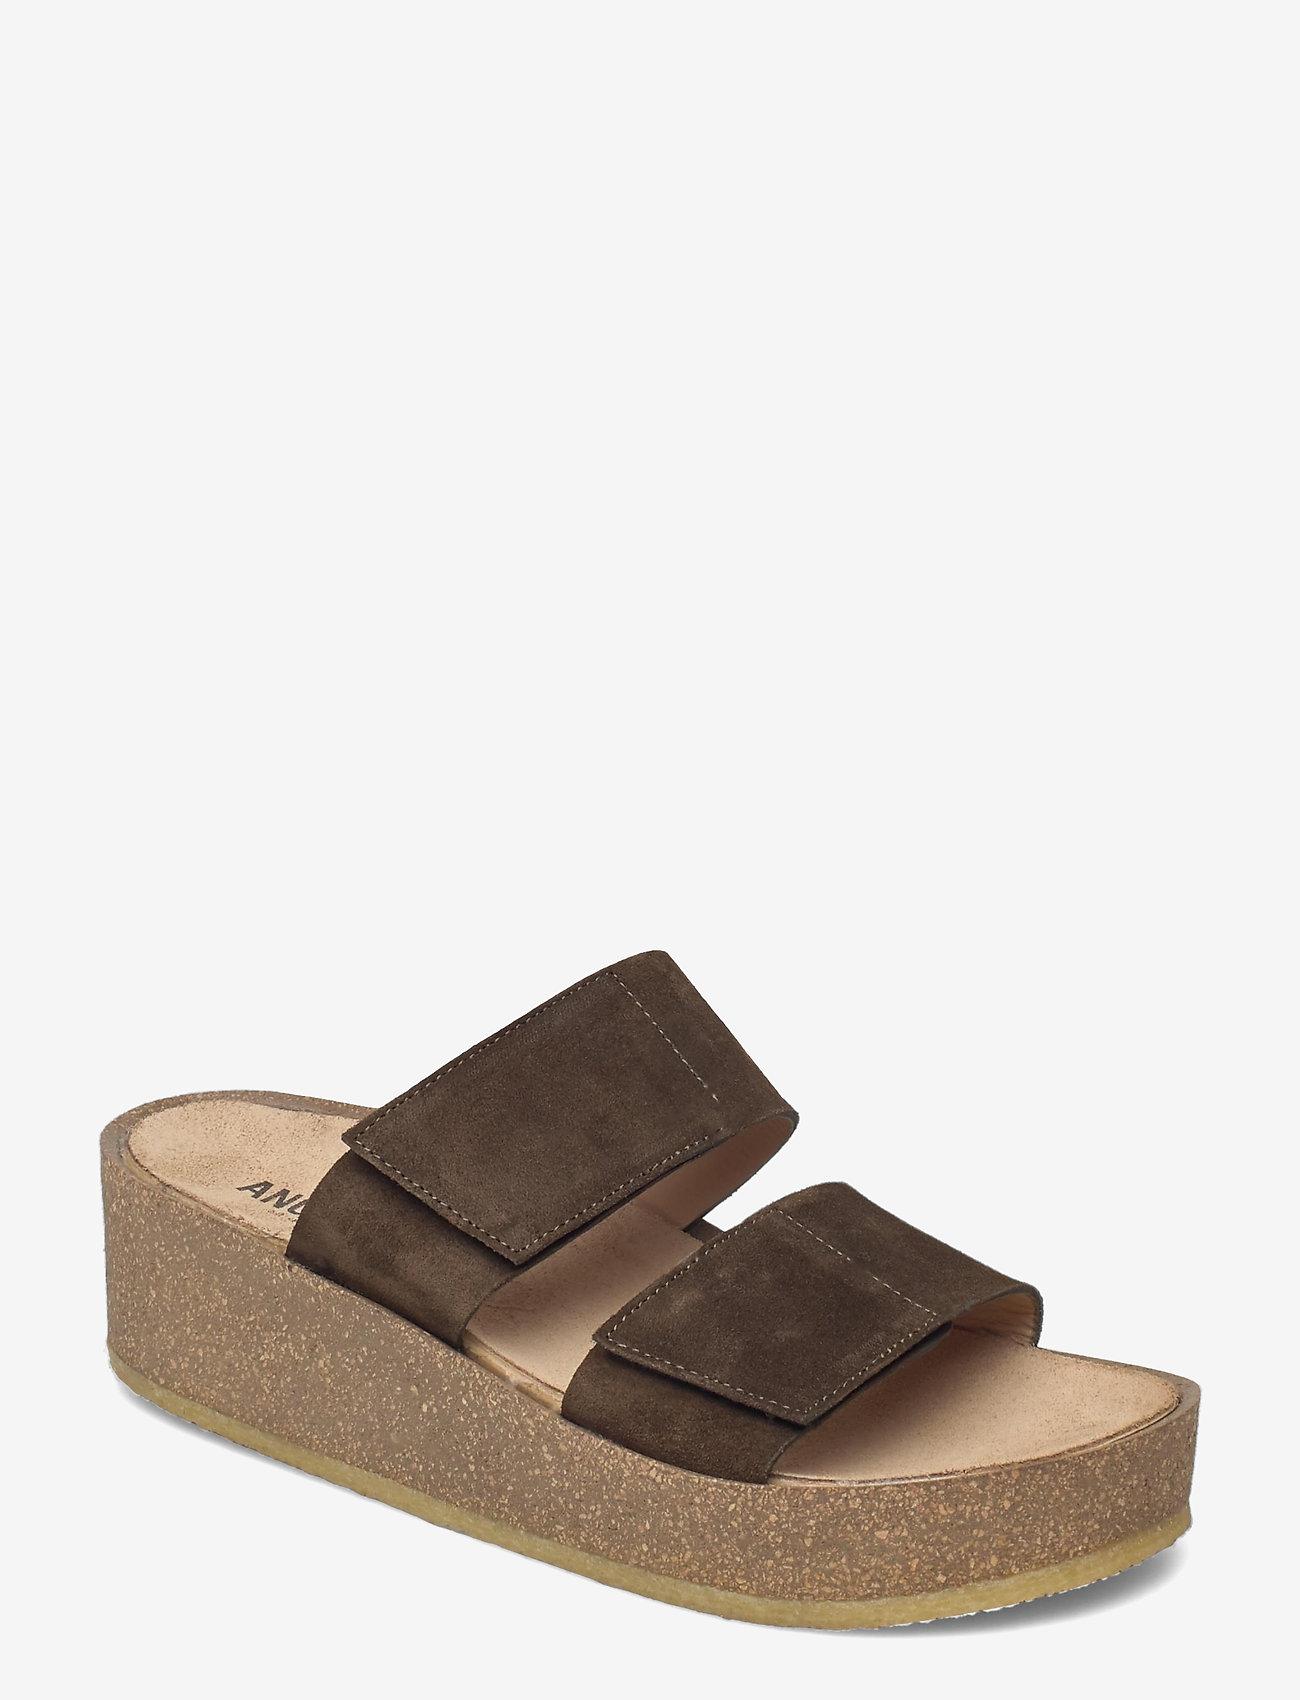 ANGULUS - Sandals - flat - open toe - op - sandalen mit absatz - 2214 dark olive - 0